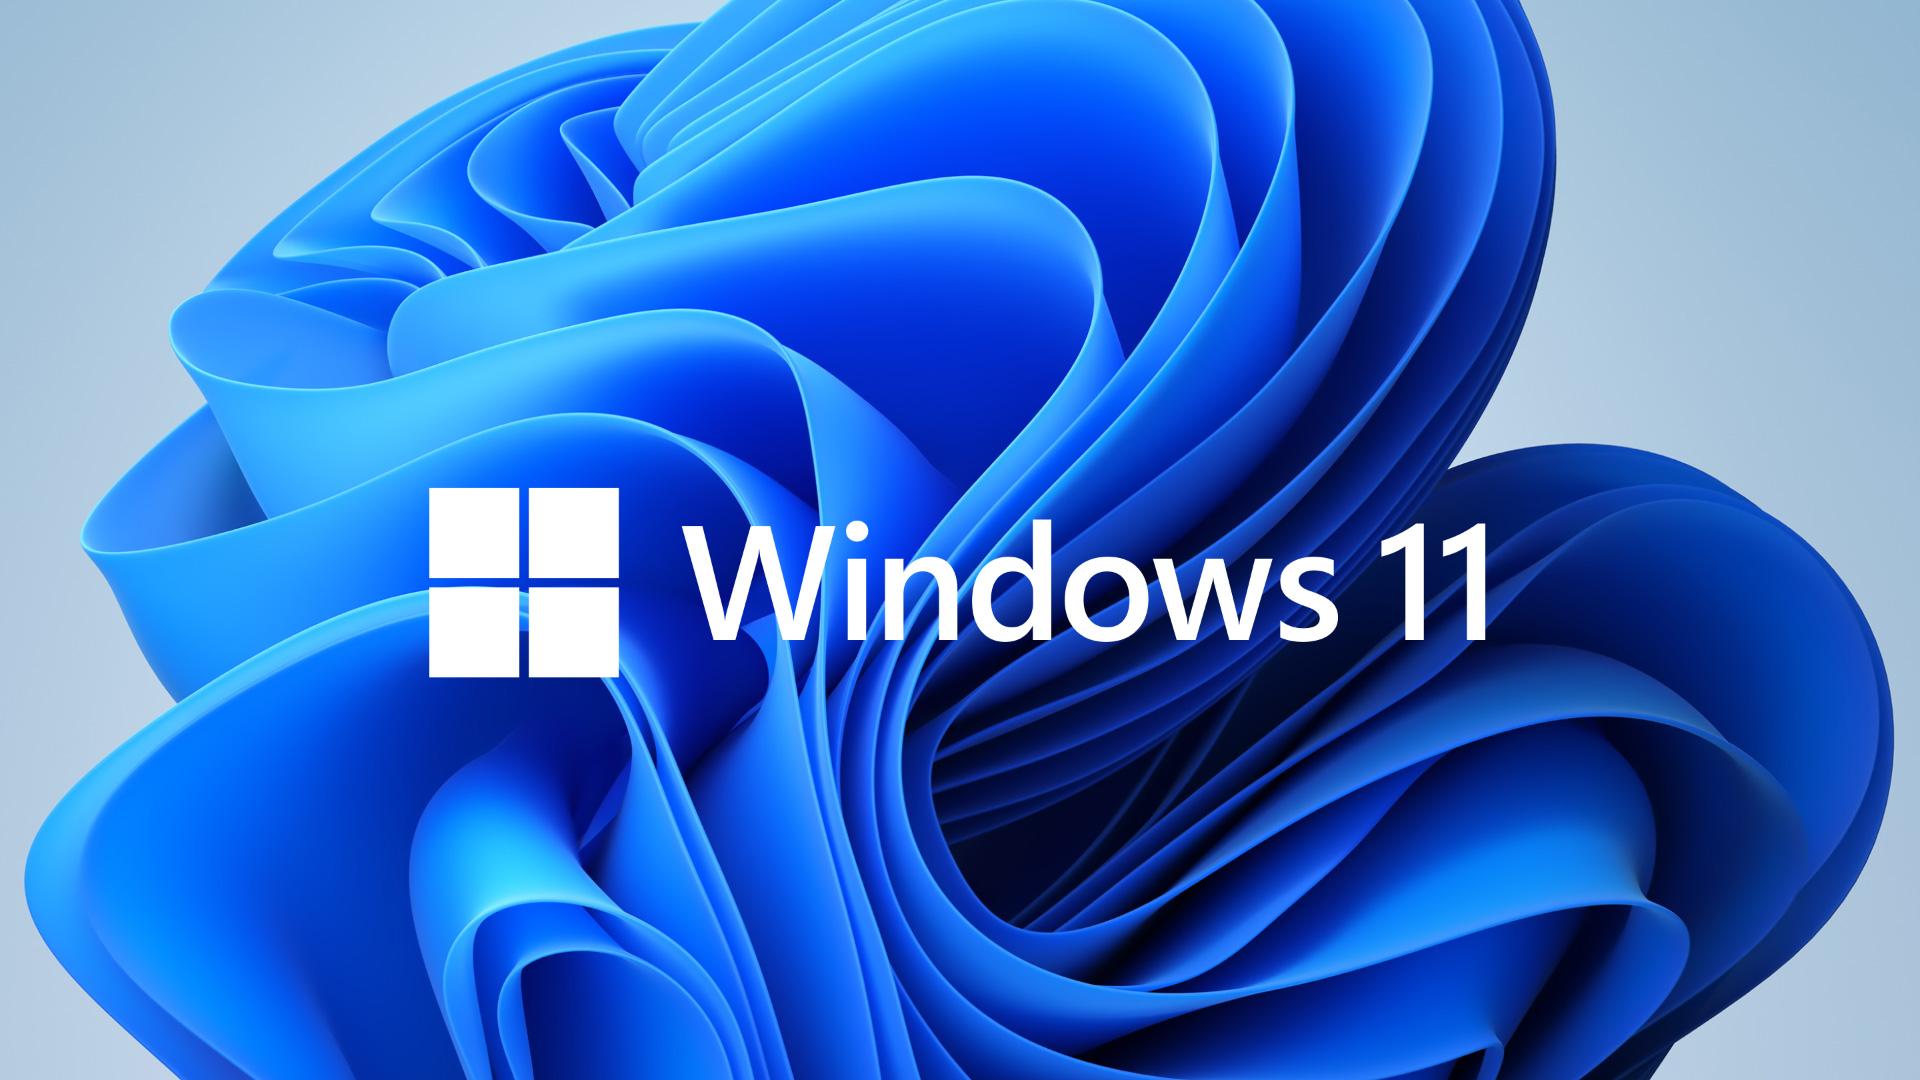 Windows 11 标识与装饰背景